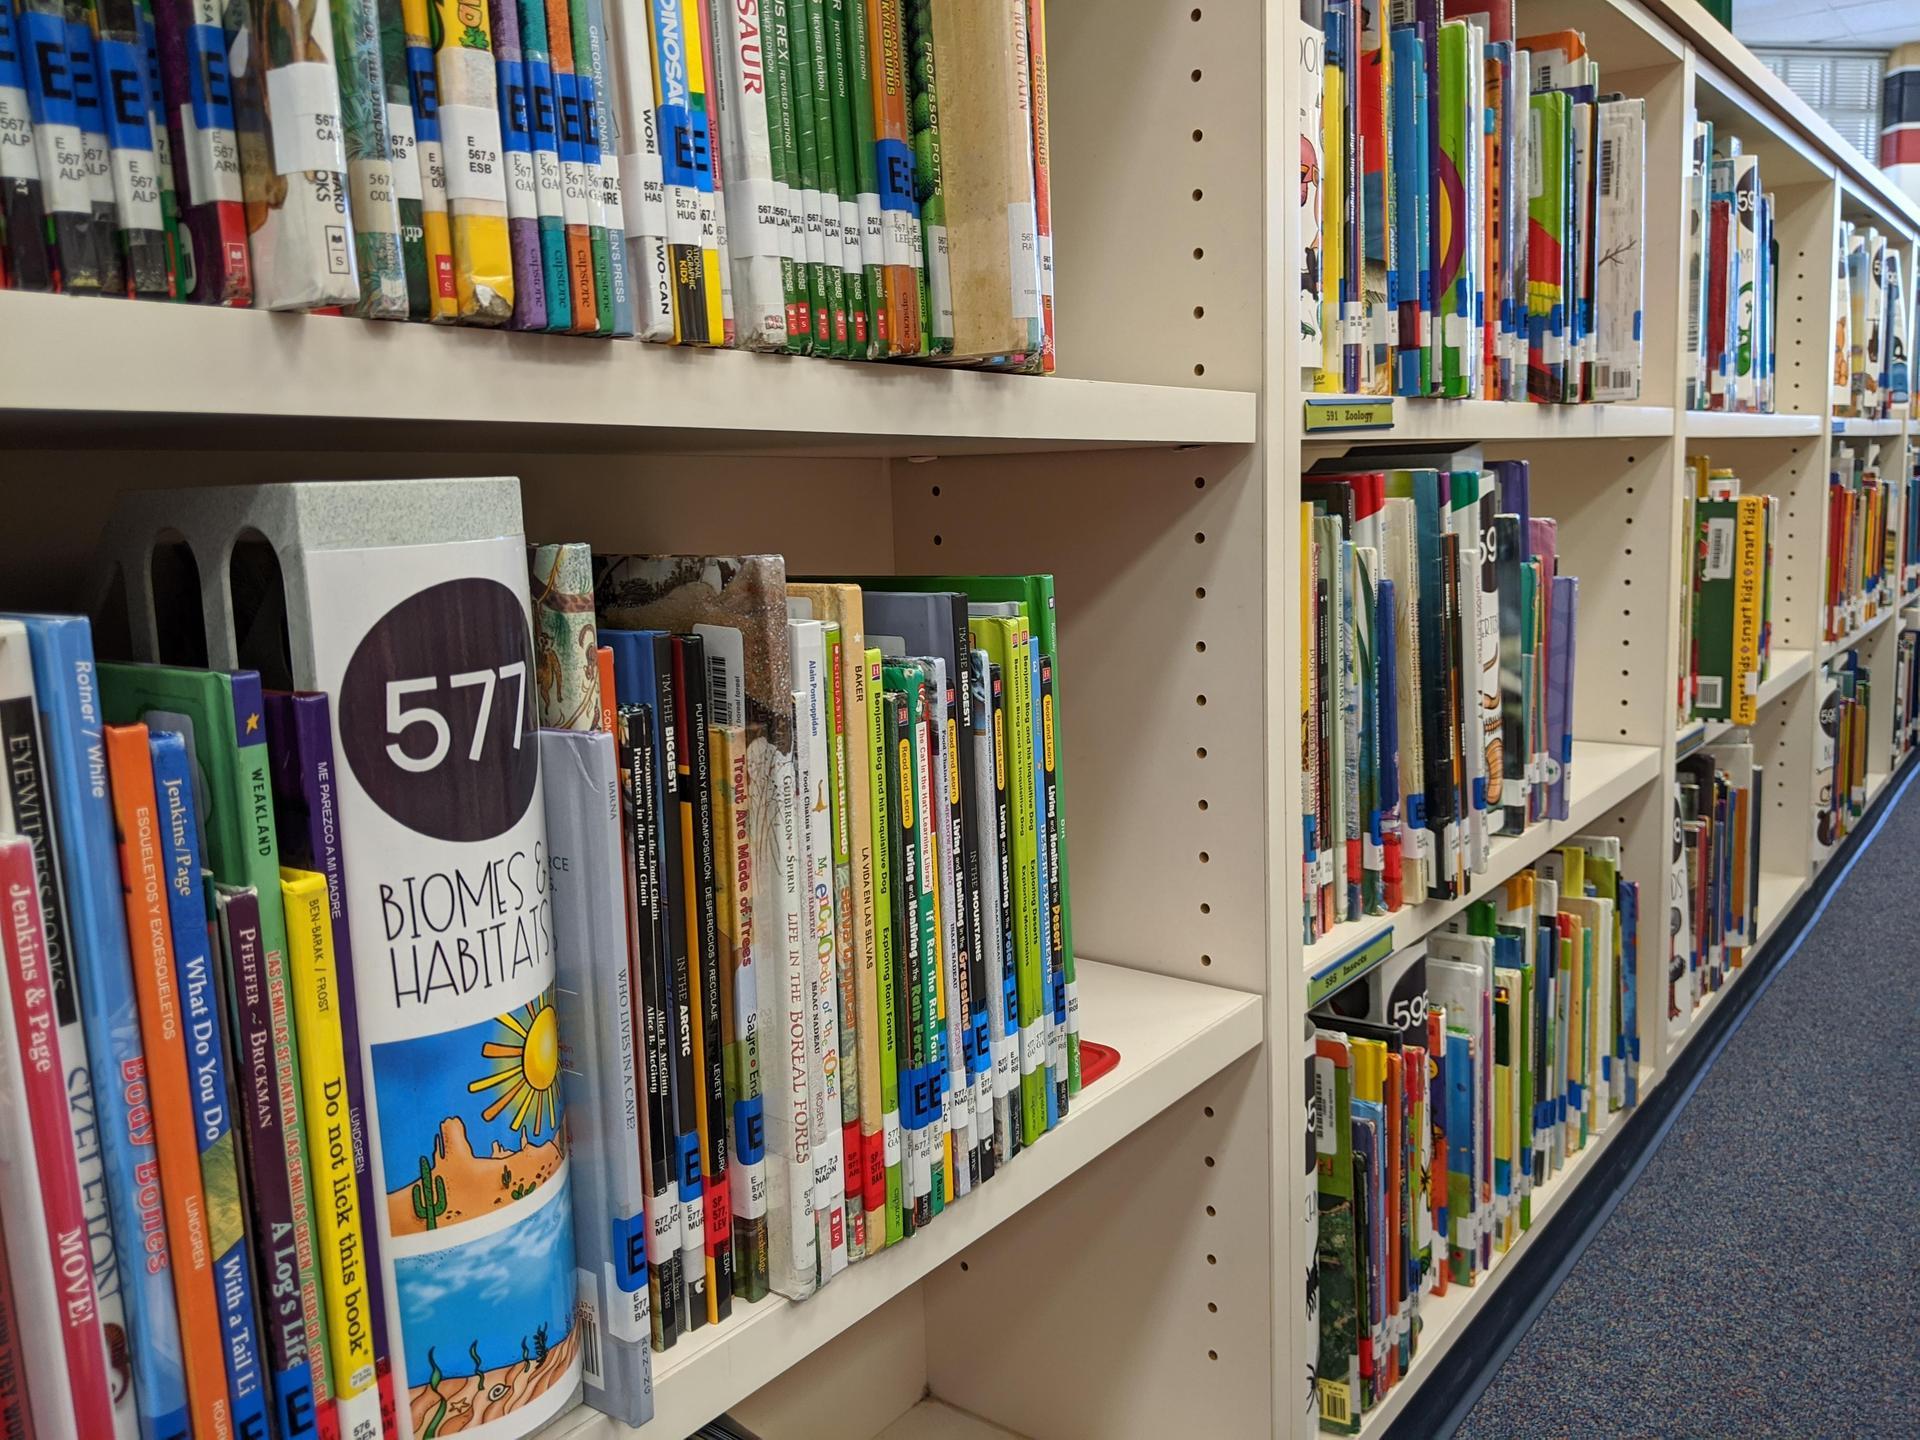 Wedge Book Shelves